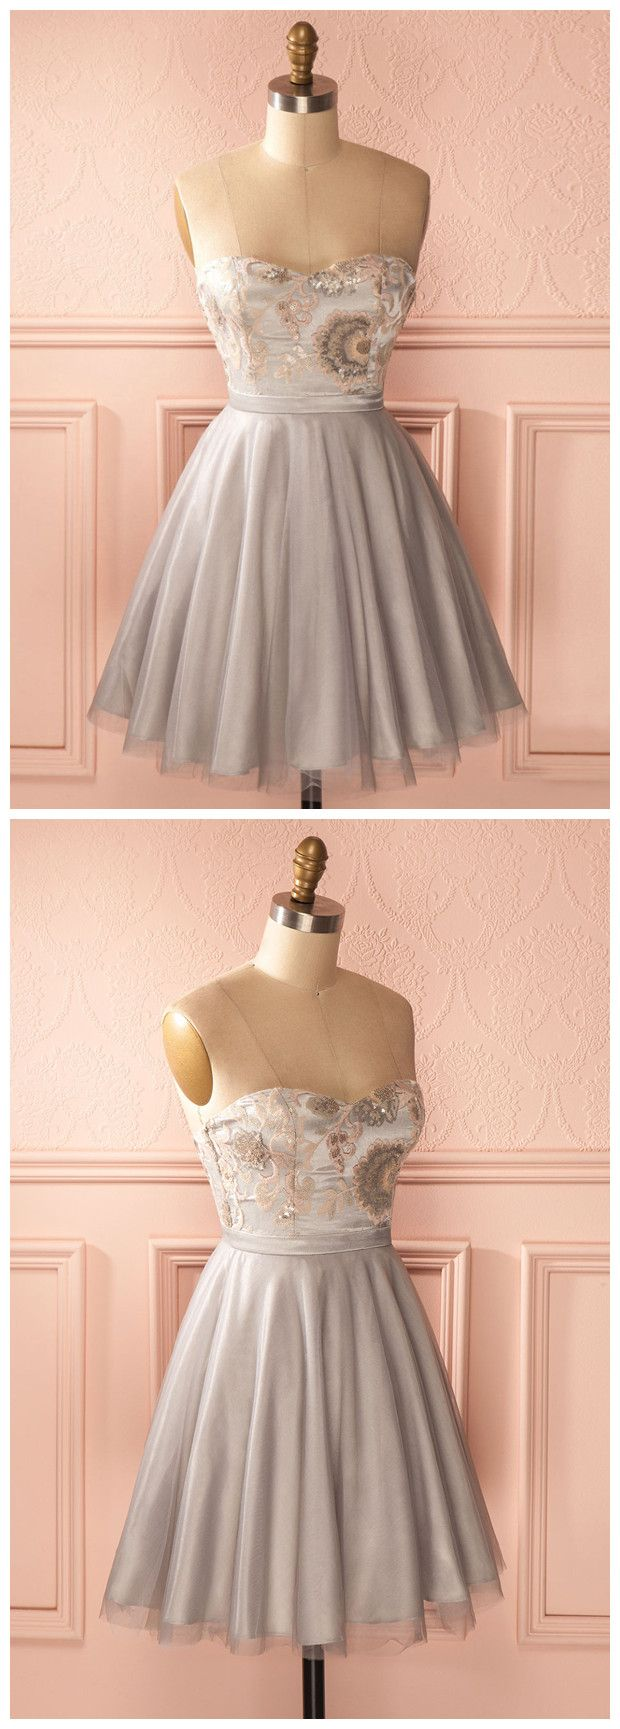 Aline sweetheart short prom dress cheap silver homecoming dress